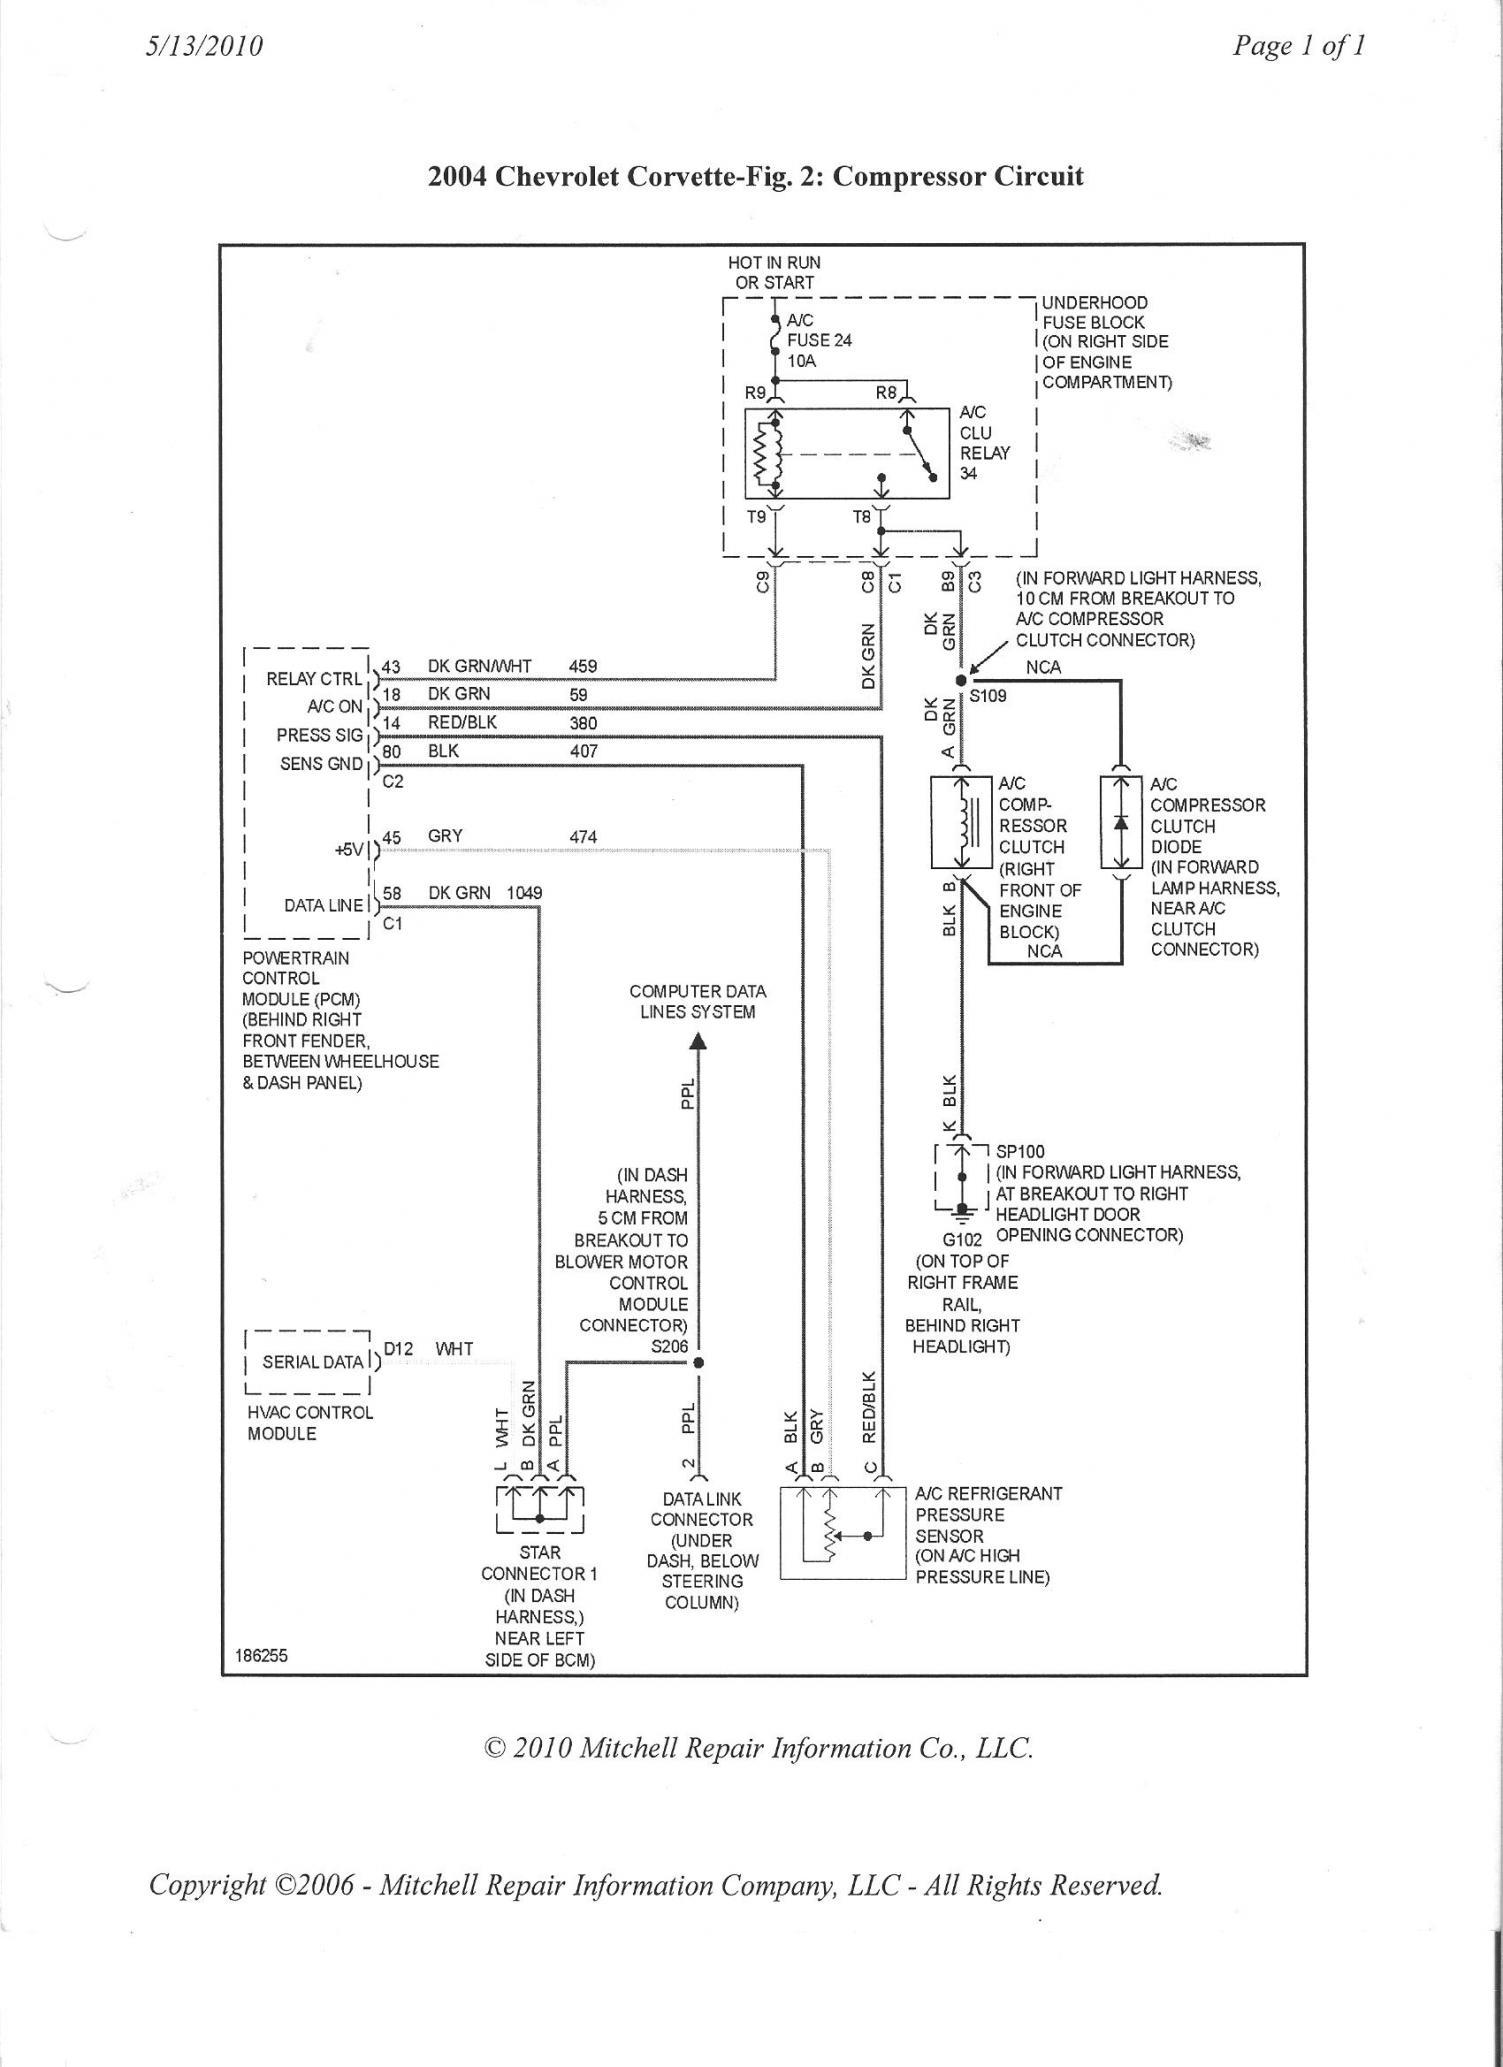 hyundai entourage headlight switch wiring diagram gm headlight switch 407 wiring diagram e4 wiring diagram  gm headlight switch 407 wiring diagram